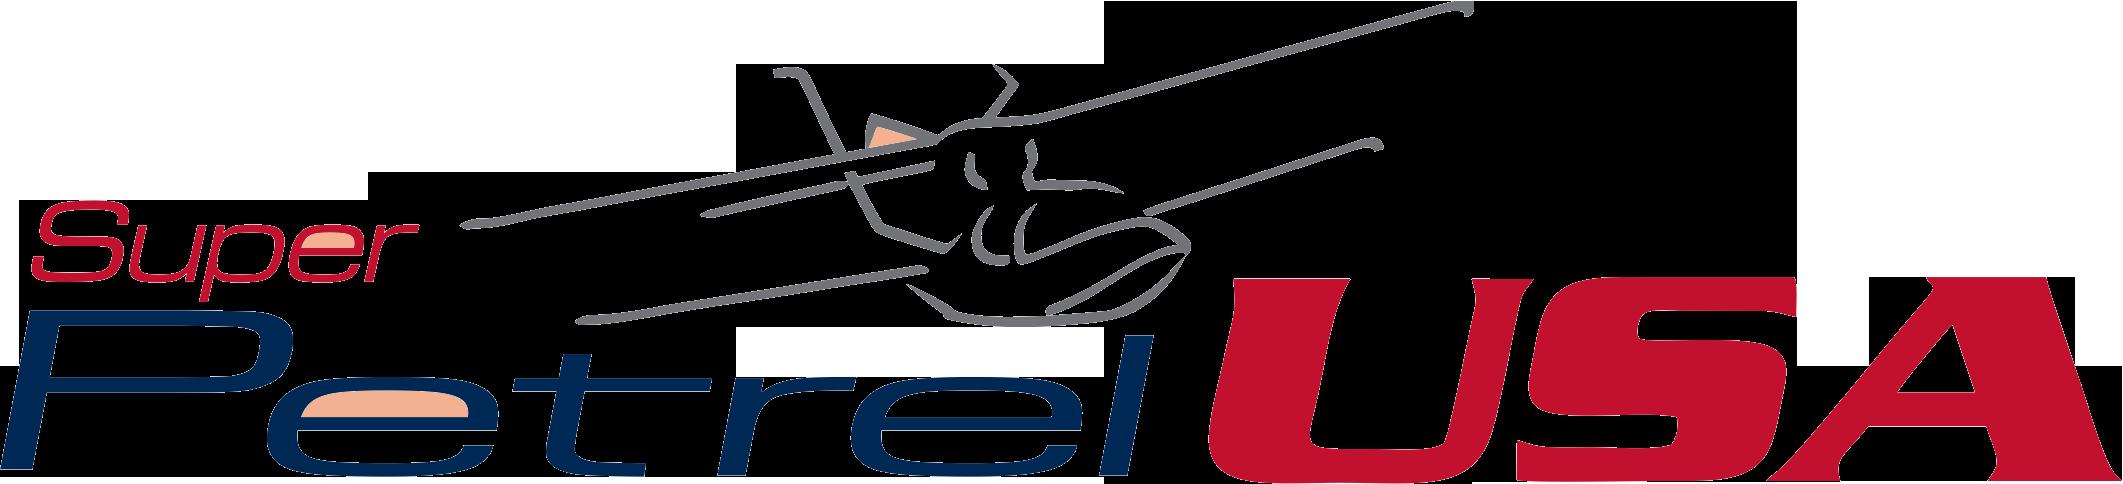 Super Petrel USA Logo